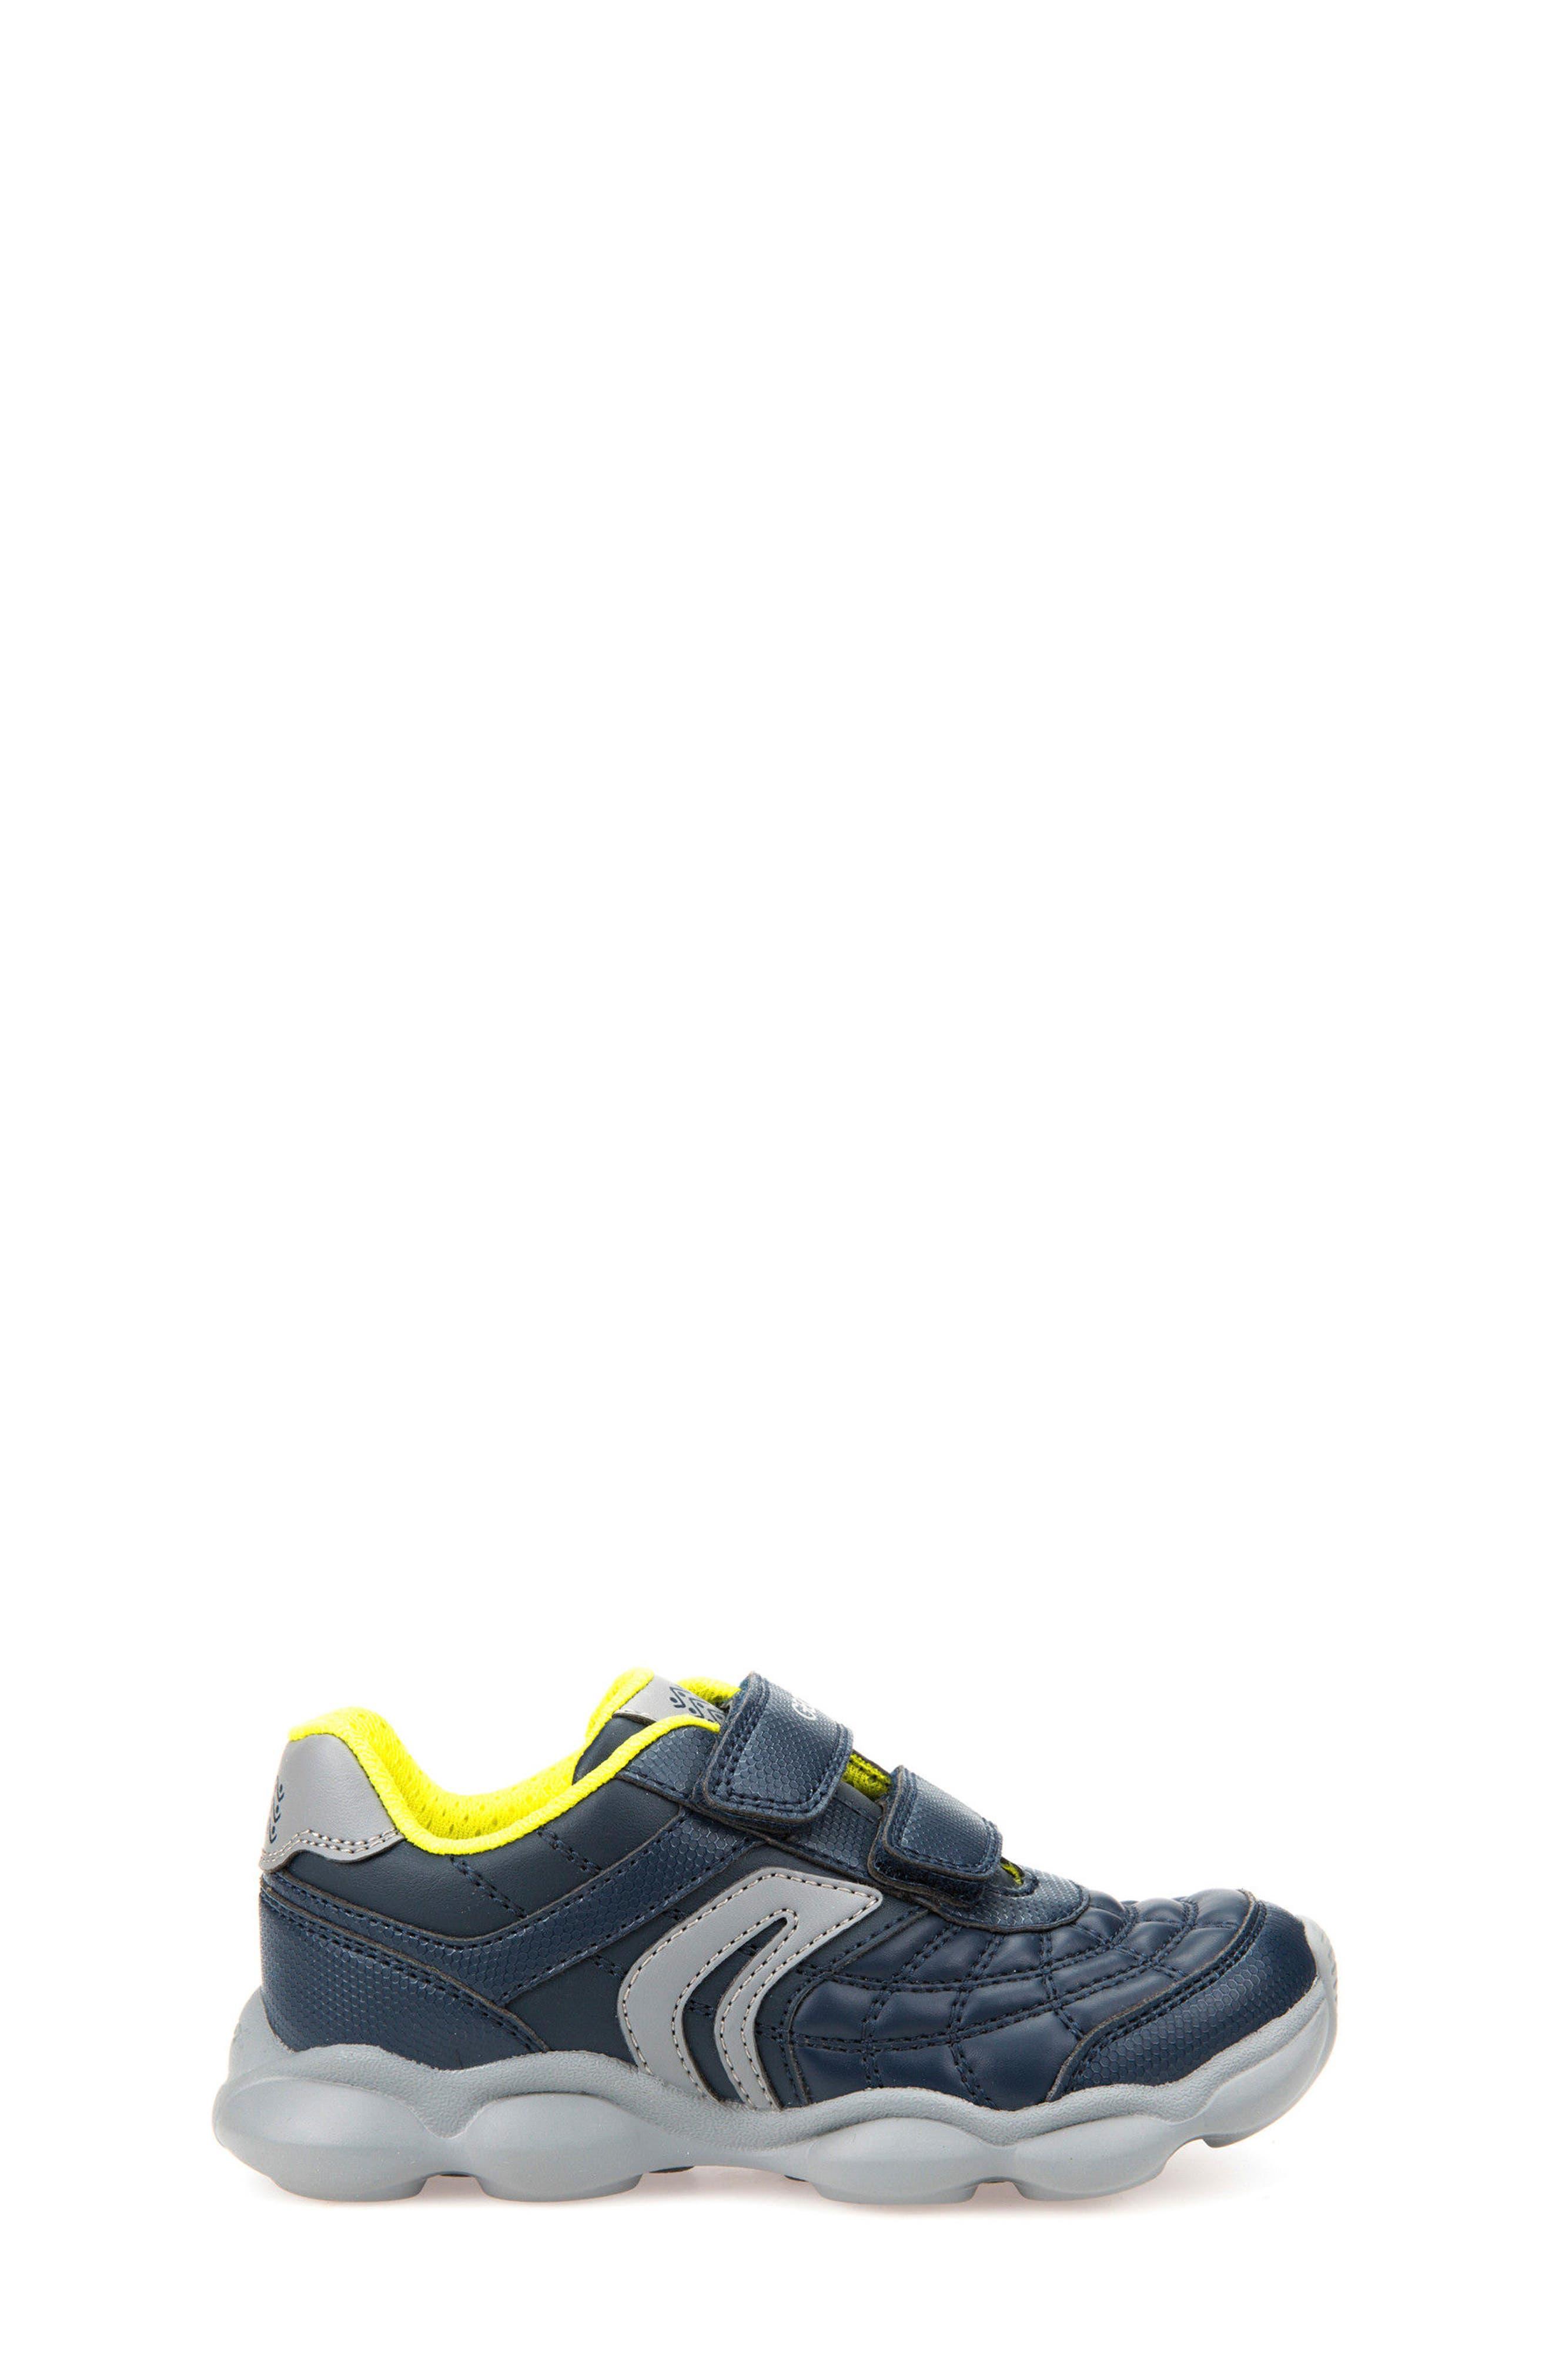 Munfrey Sneaker,                             Alternate thumbnail 3, color,                             Navy/ Grey